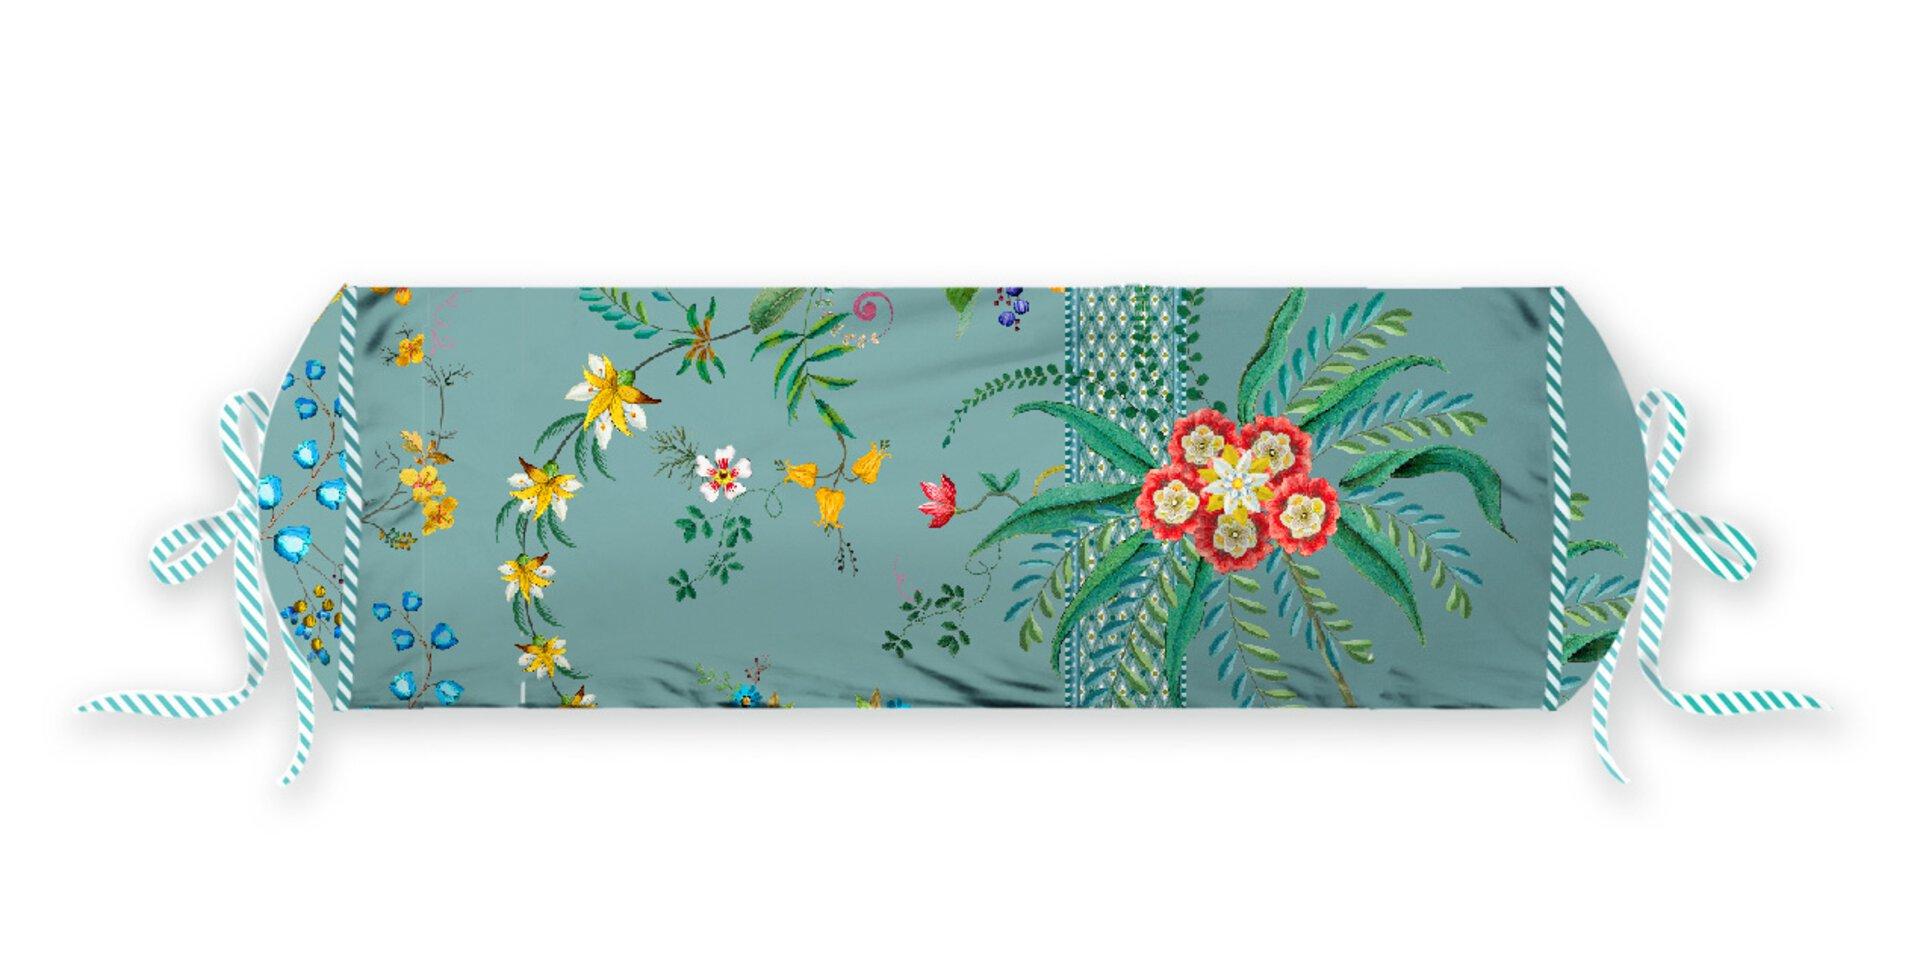 Nackenrolle Petites Fleurs PIP STUDIO Textil Blau 22 x 70 cm